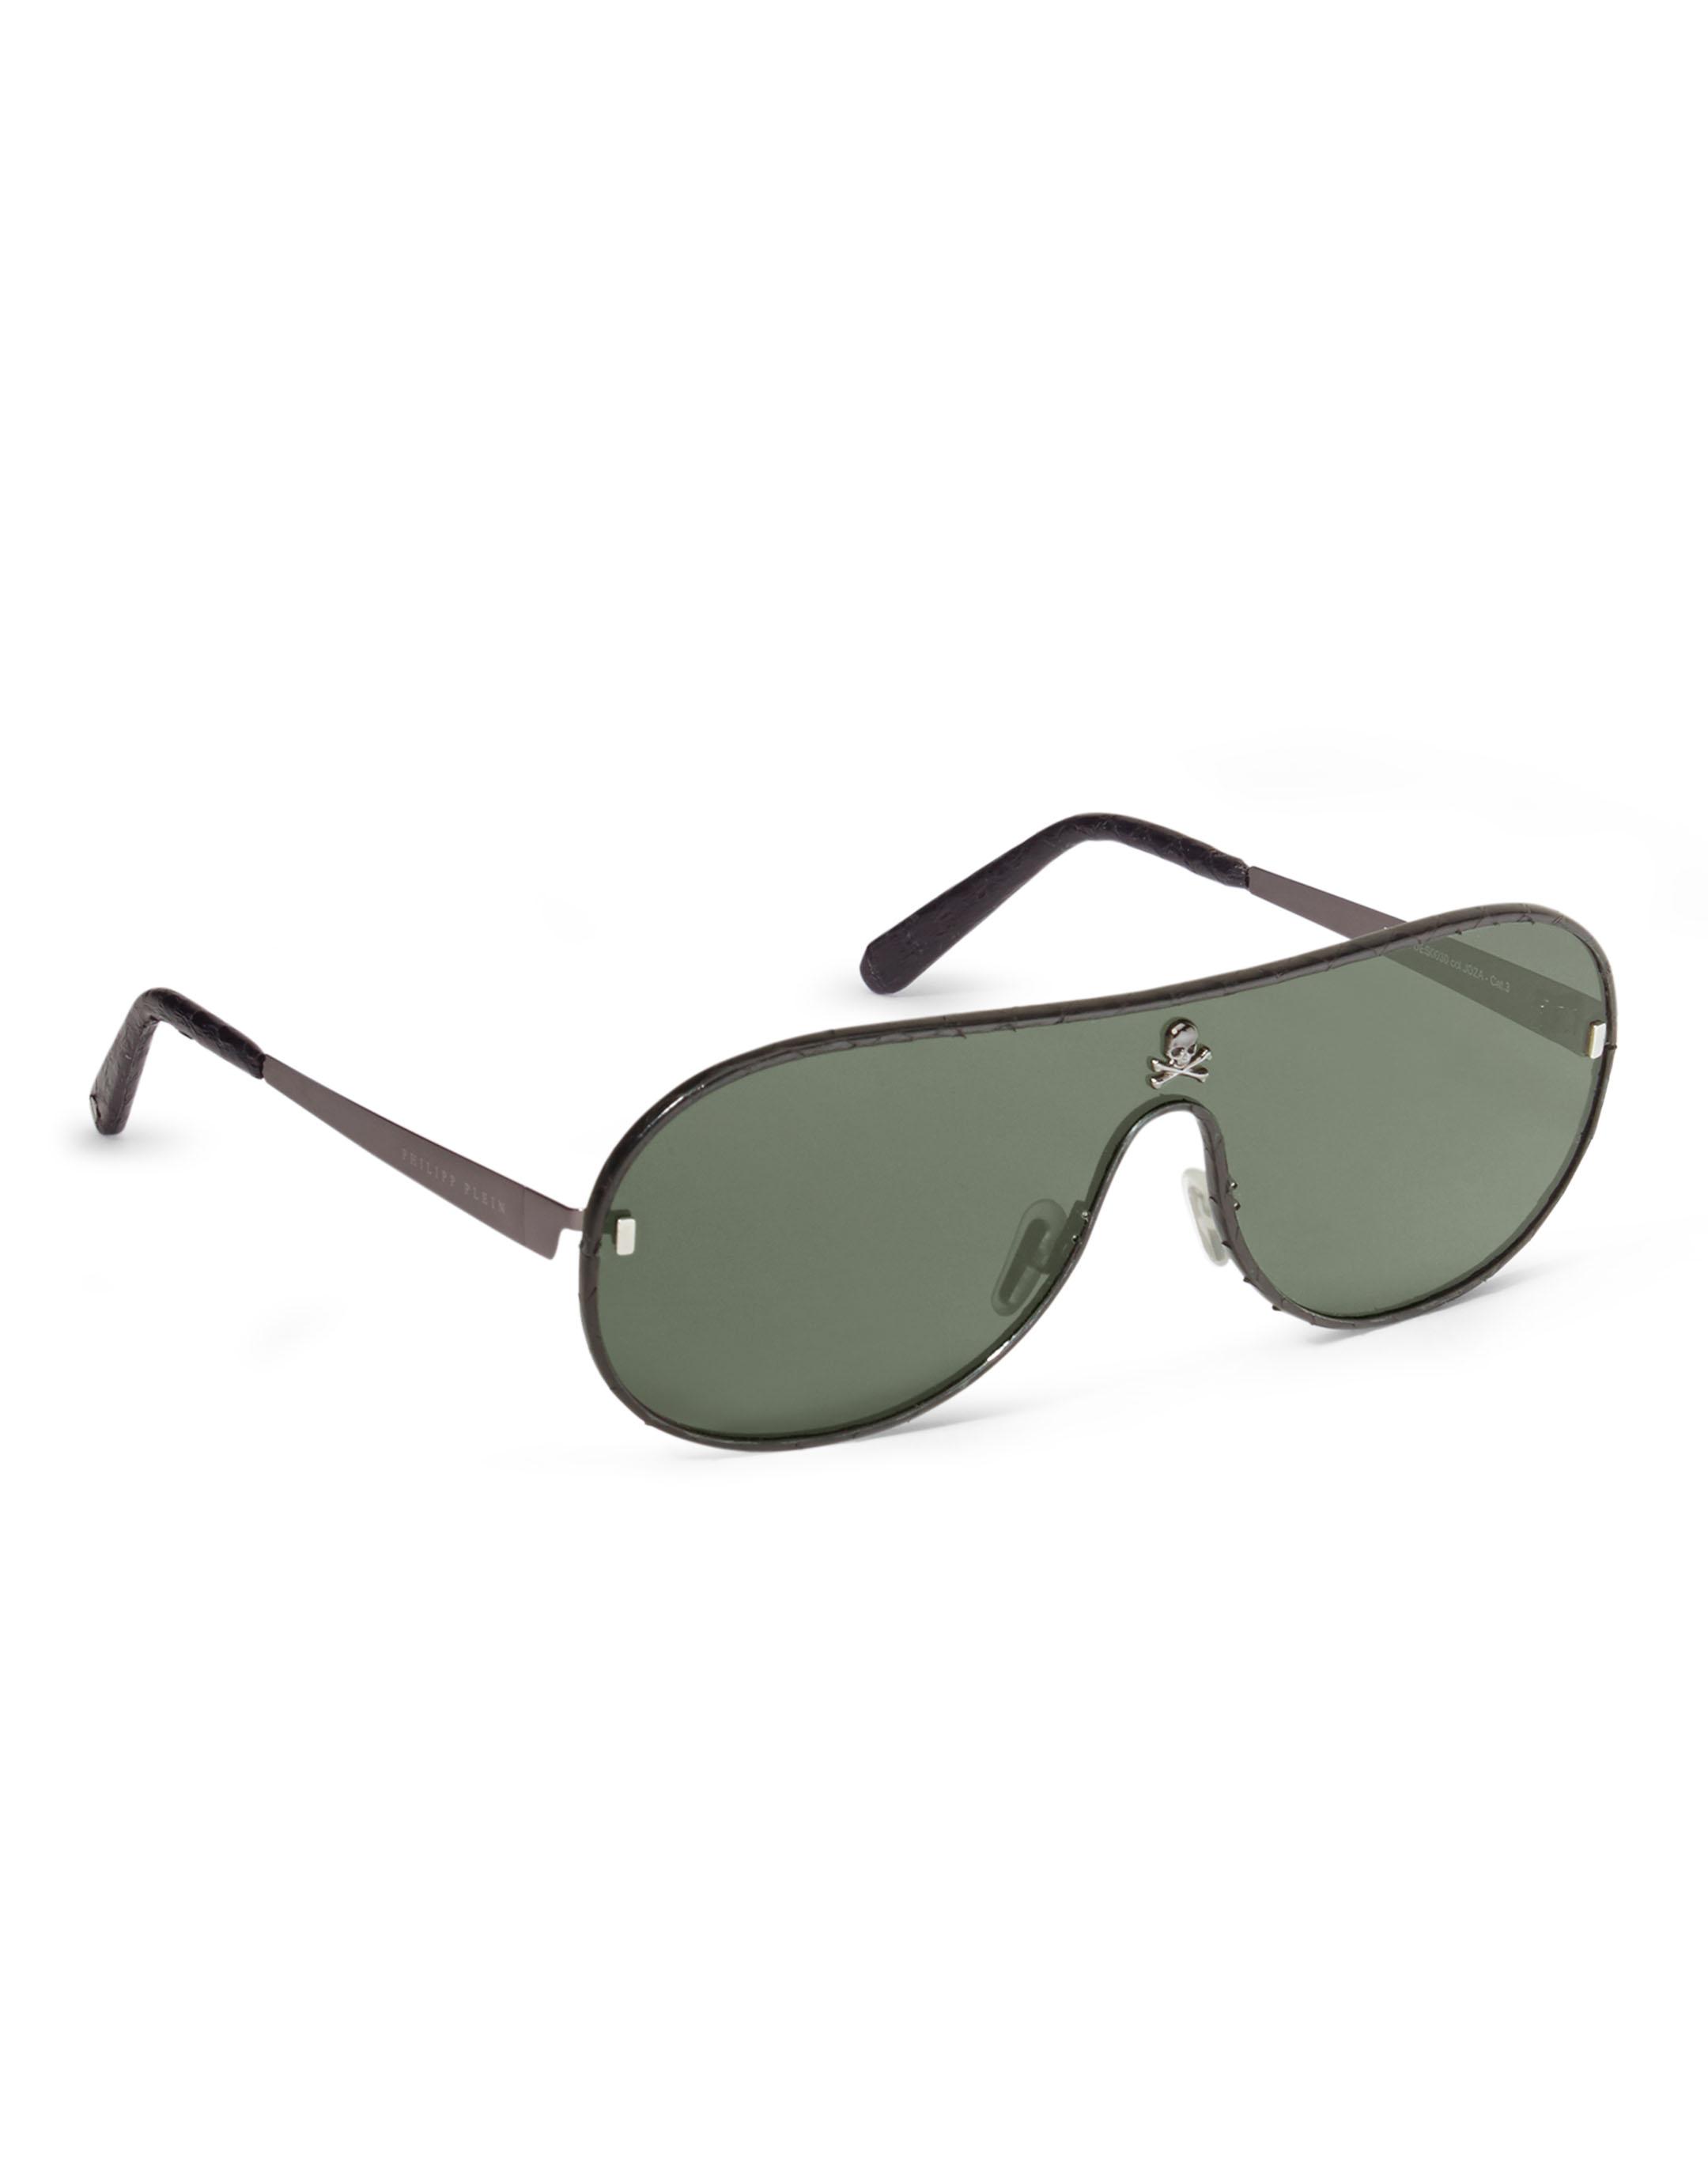 d3a1015e87fd0 Sunglasses Target Leather